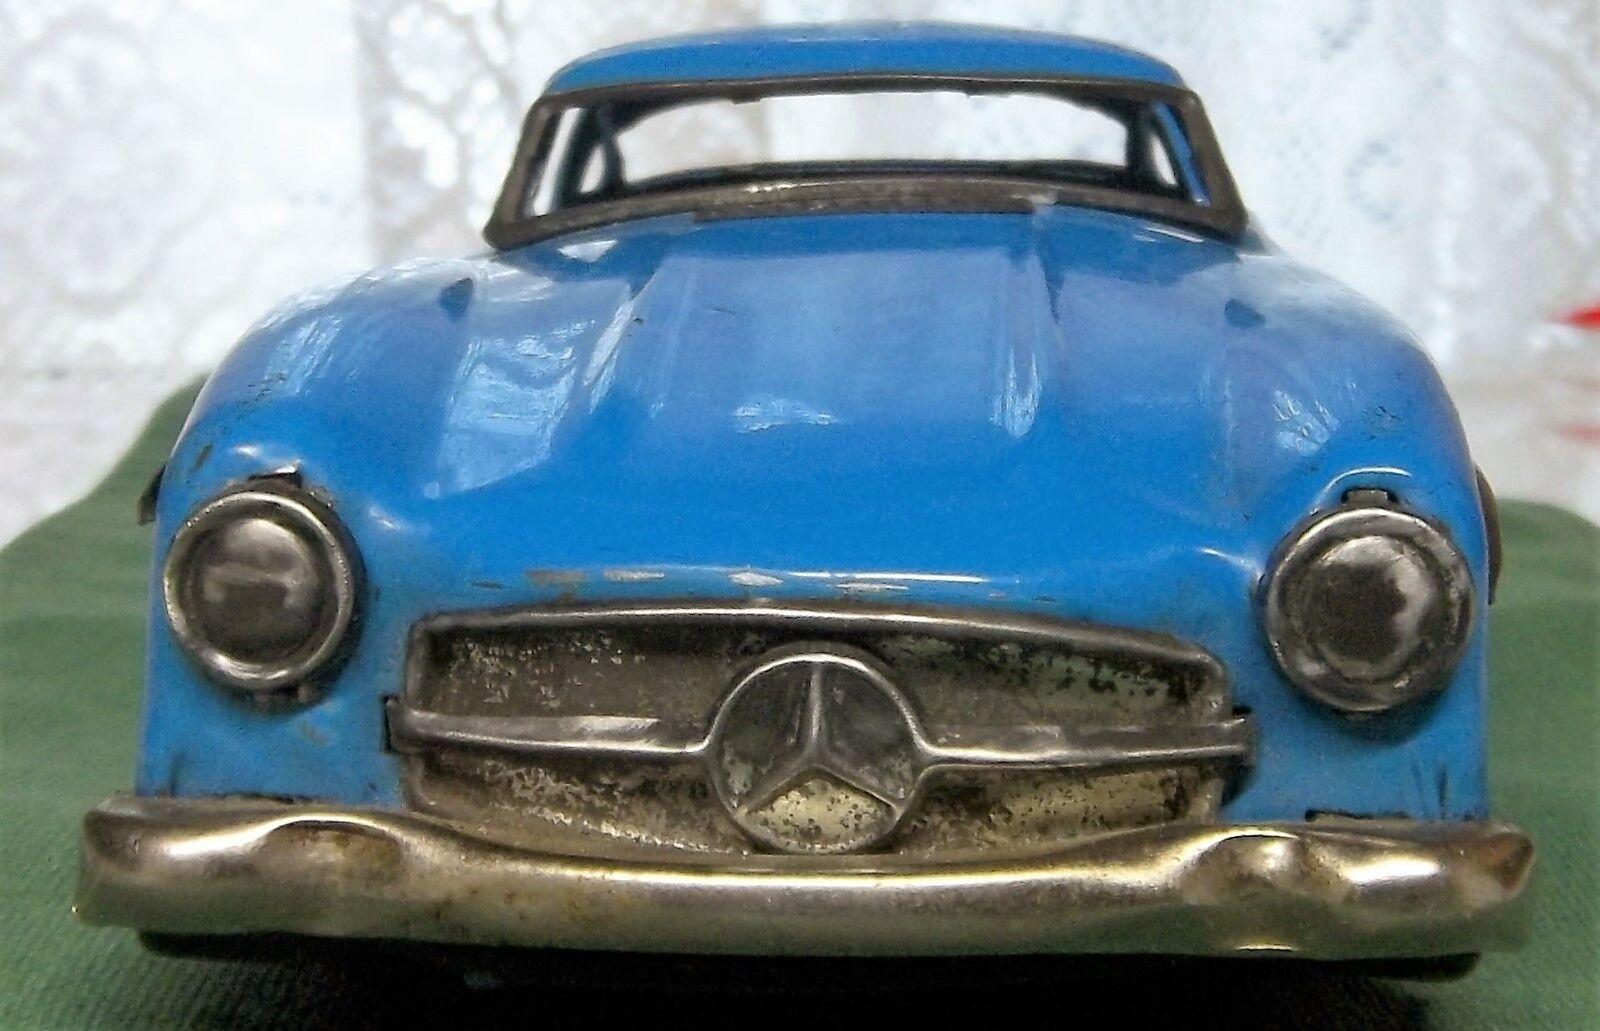 300 Benz Mercedes SL Nomura Tn agradable 300SL 8.5 Tin 300-SL Azul Mercedes Benz - 300